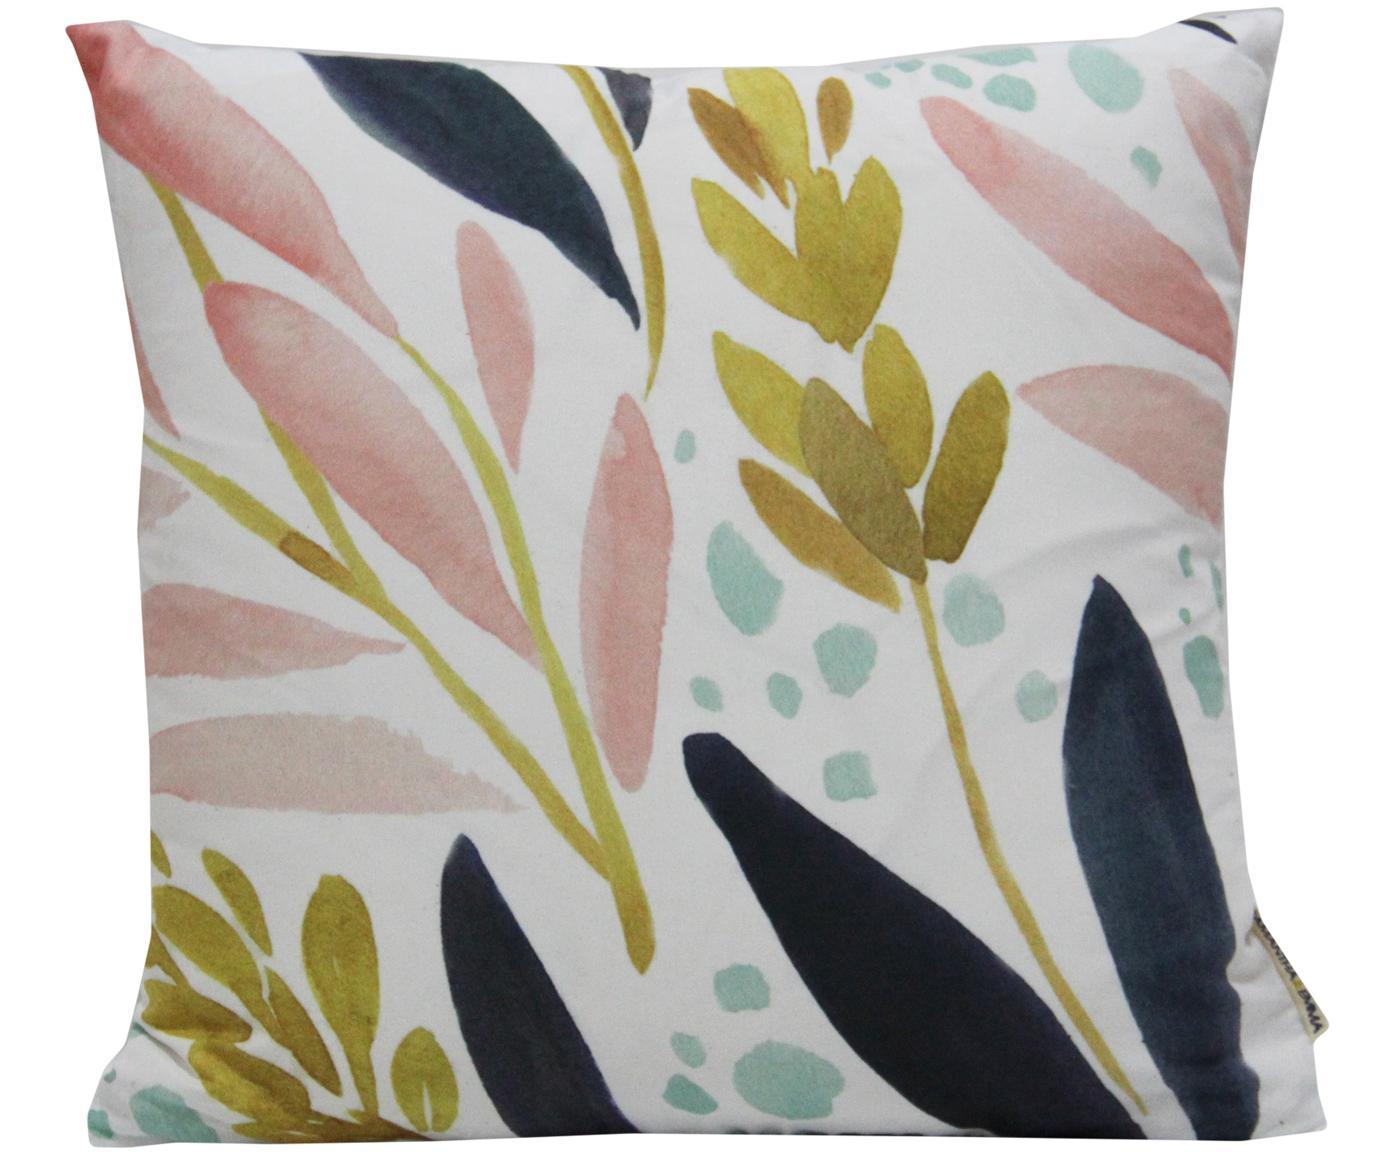 Kissenhülle Agia mit Aquarell Print, 100% Polyester, Weiss, Dunkelblau, Hellblau, Rosa, Senfgelb, 40 x 40 cm